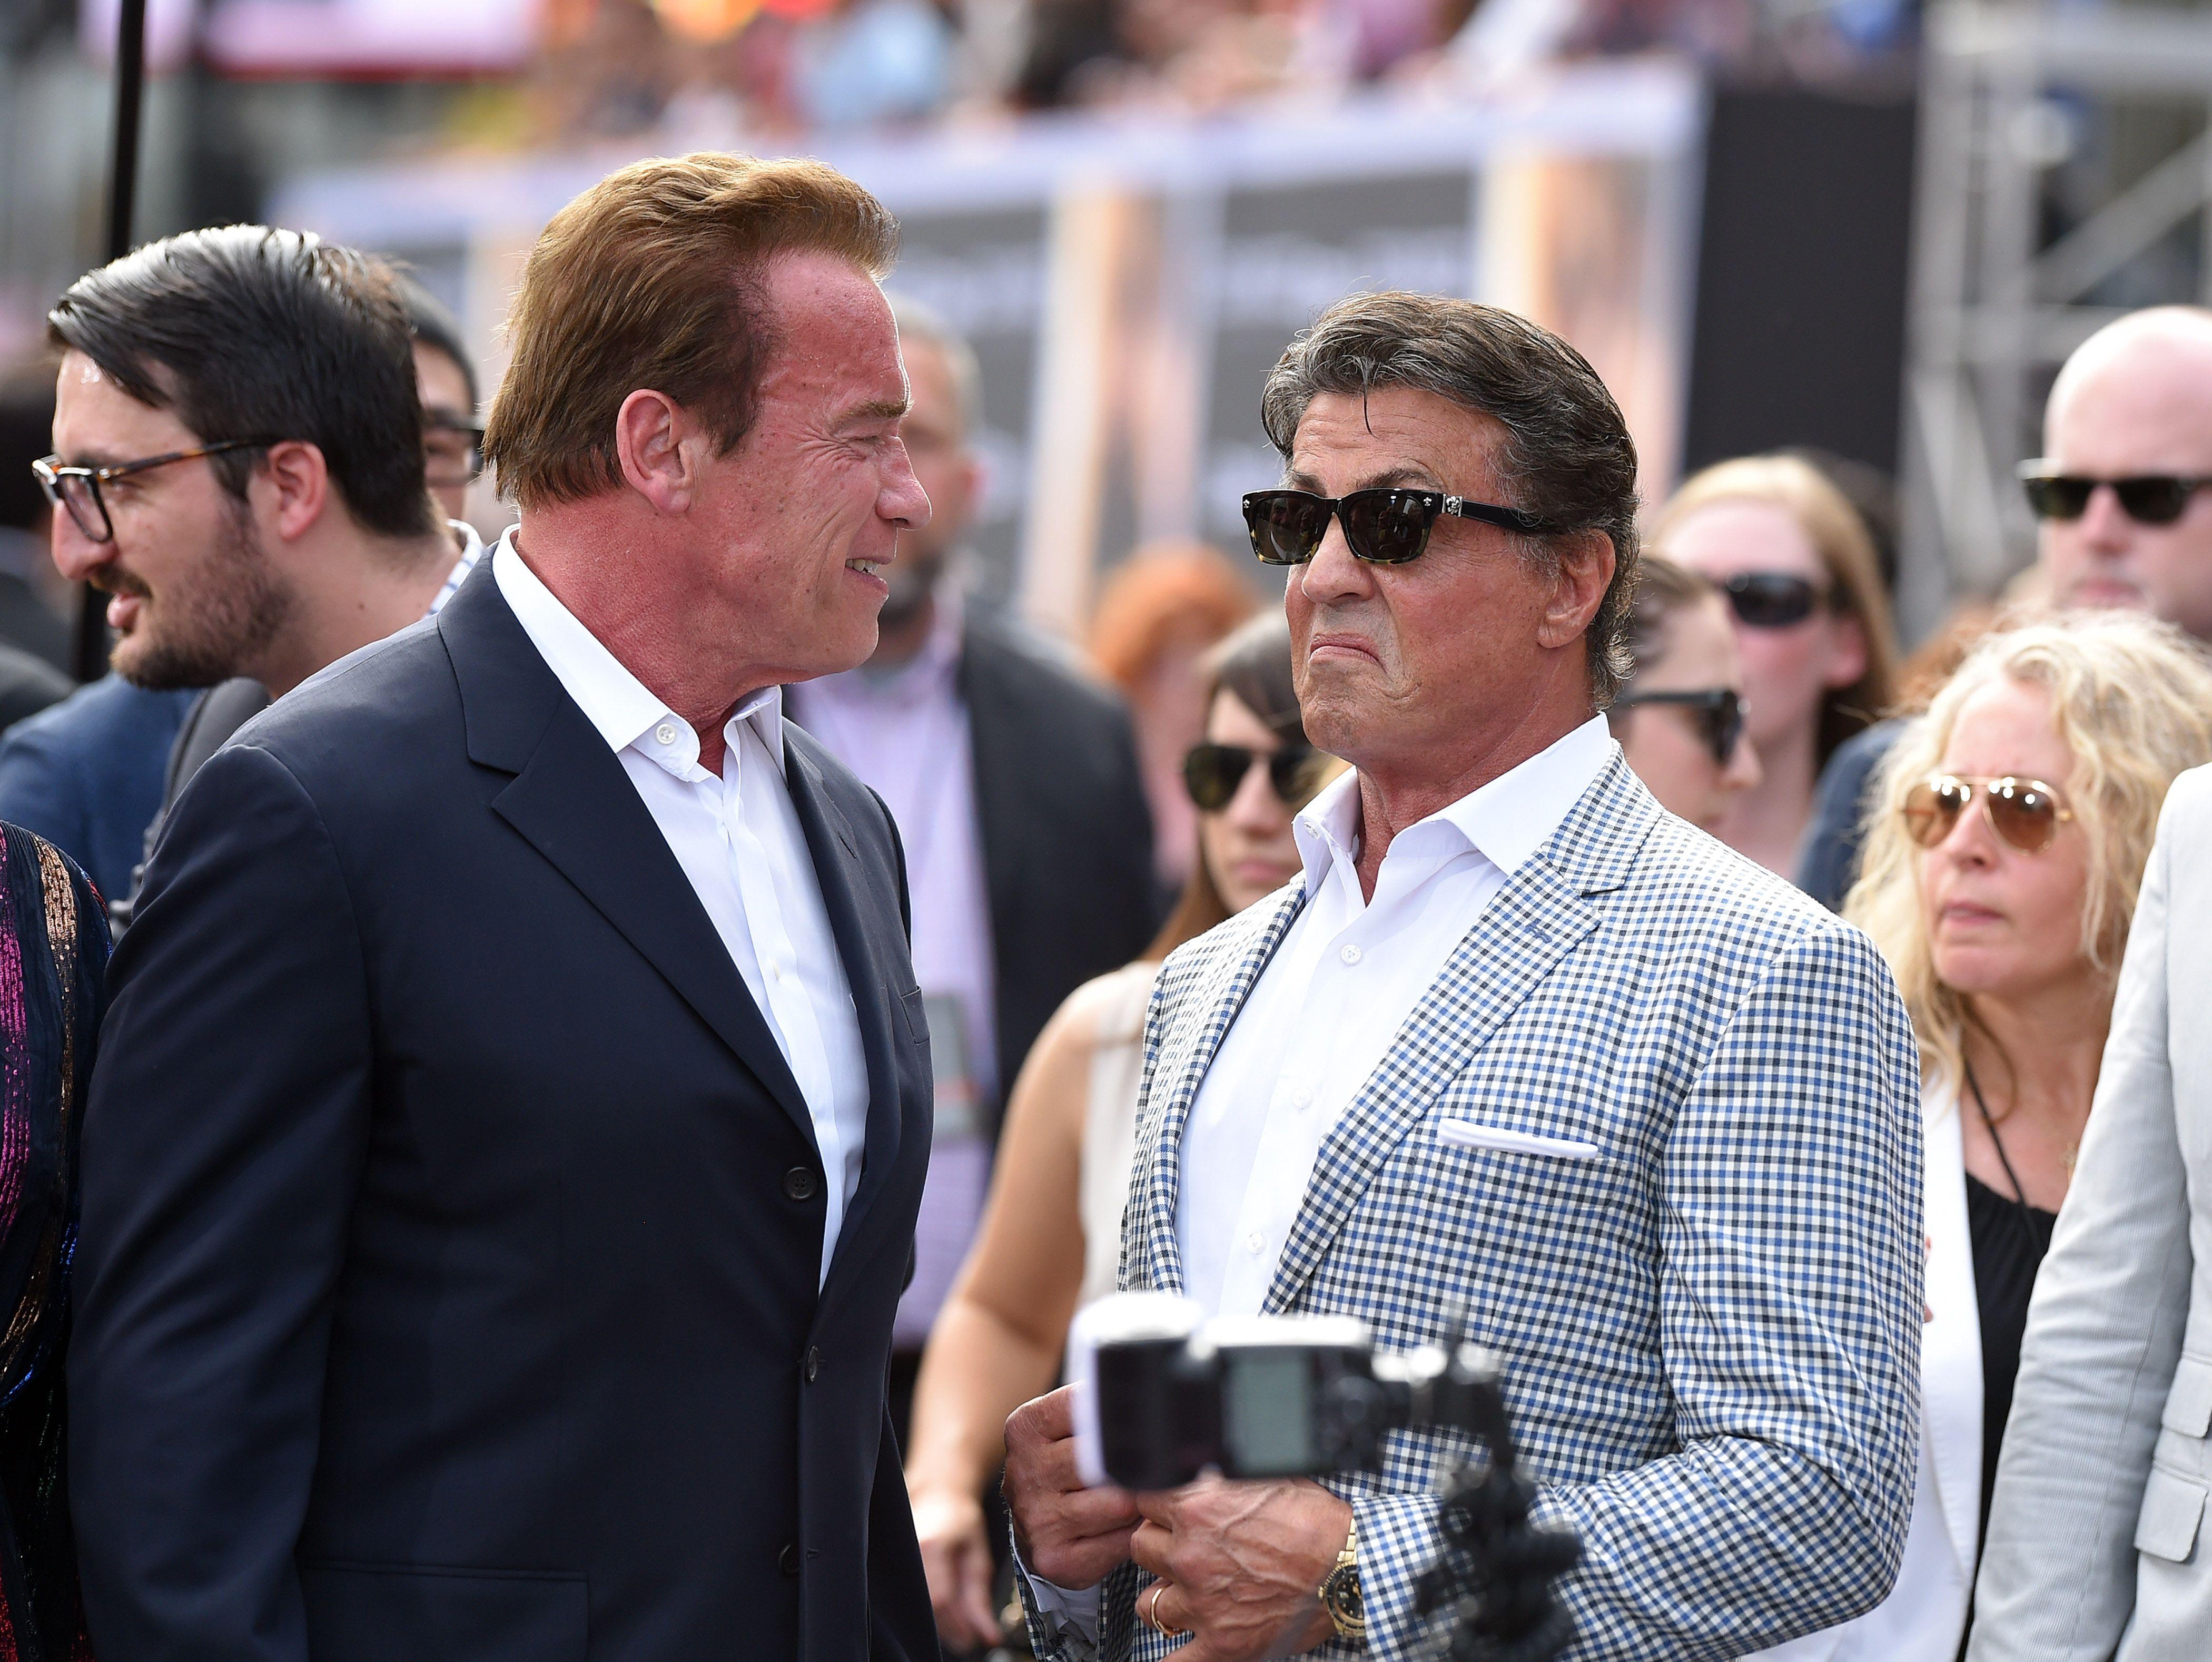 Schwarzenegger Trolls Stallone Over His 'Knife' Size in Instagram Video